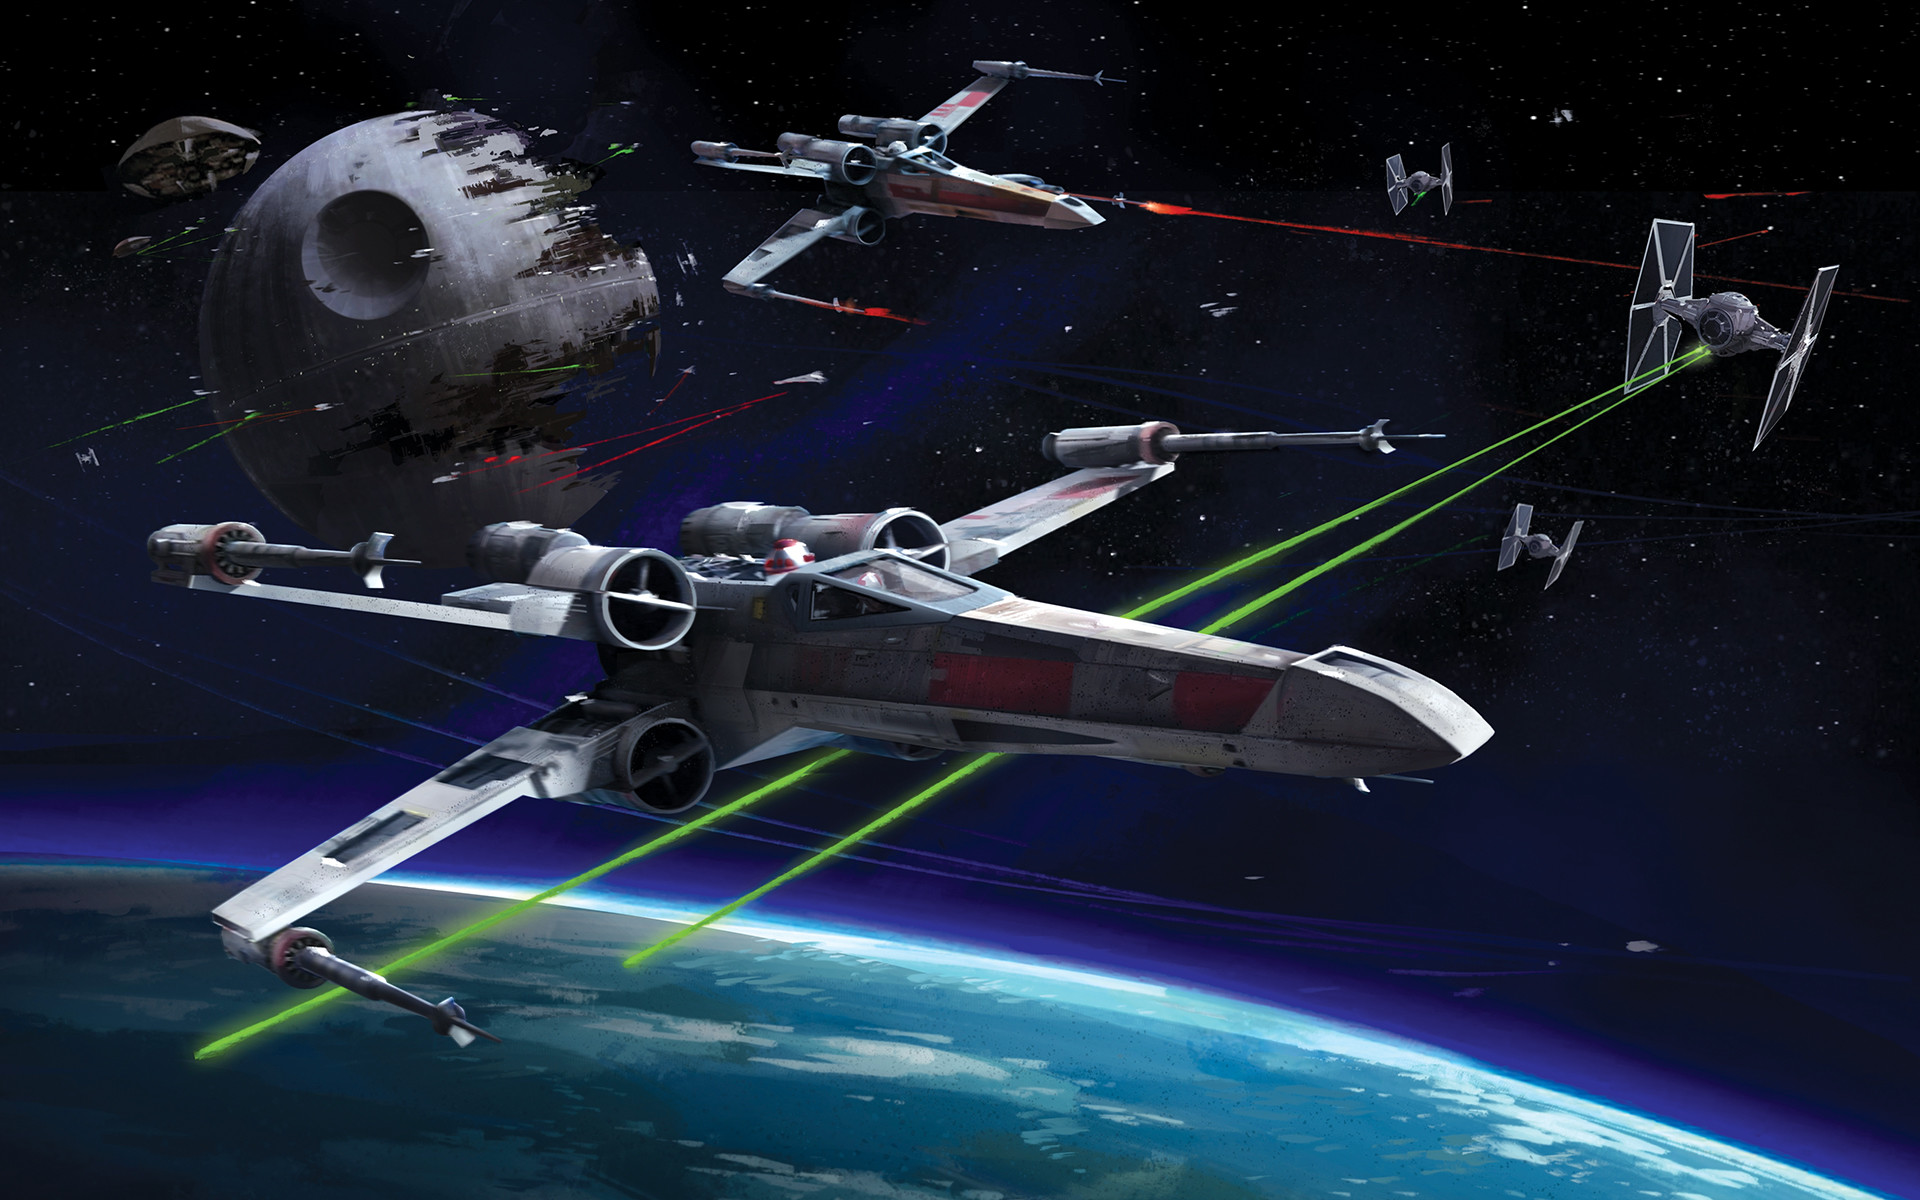 star-wars-x-wing-vs-tie-fighter-hd-wallpaper